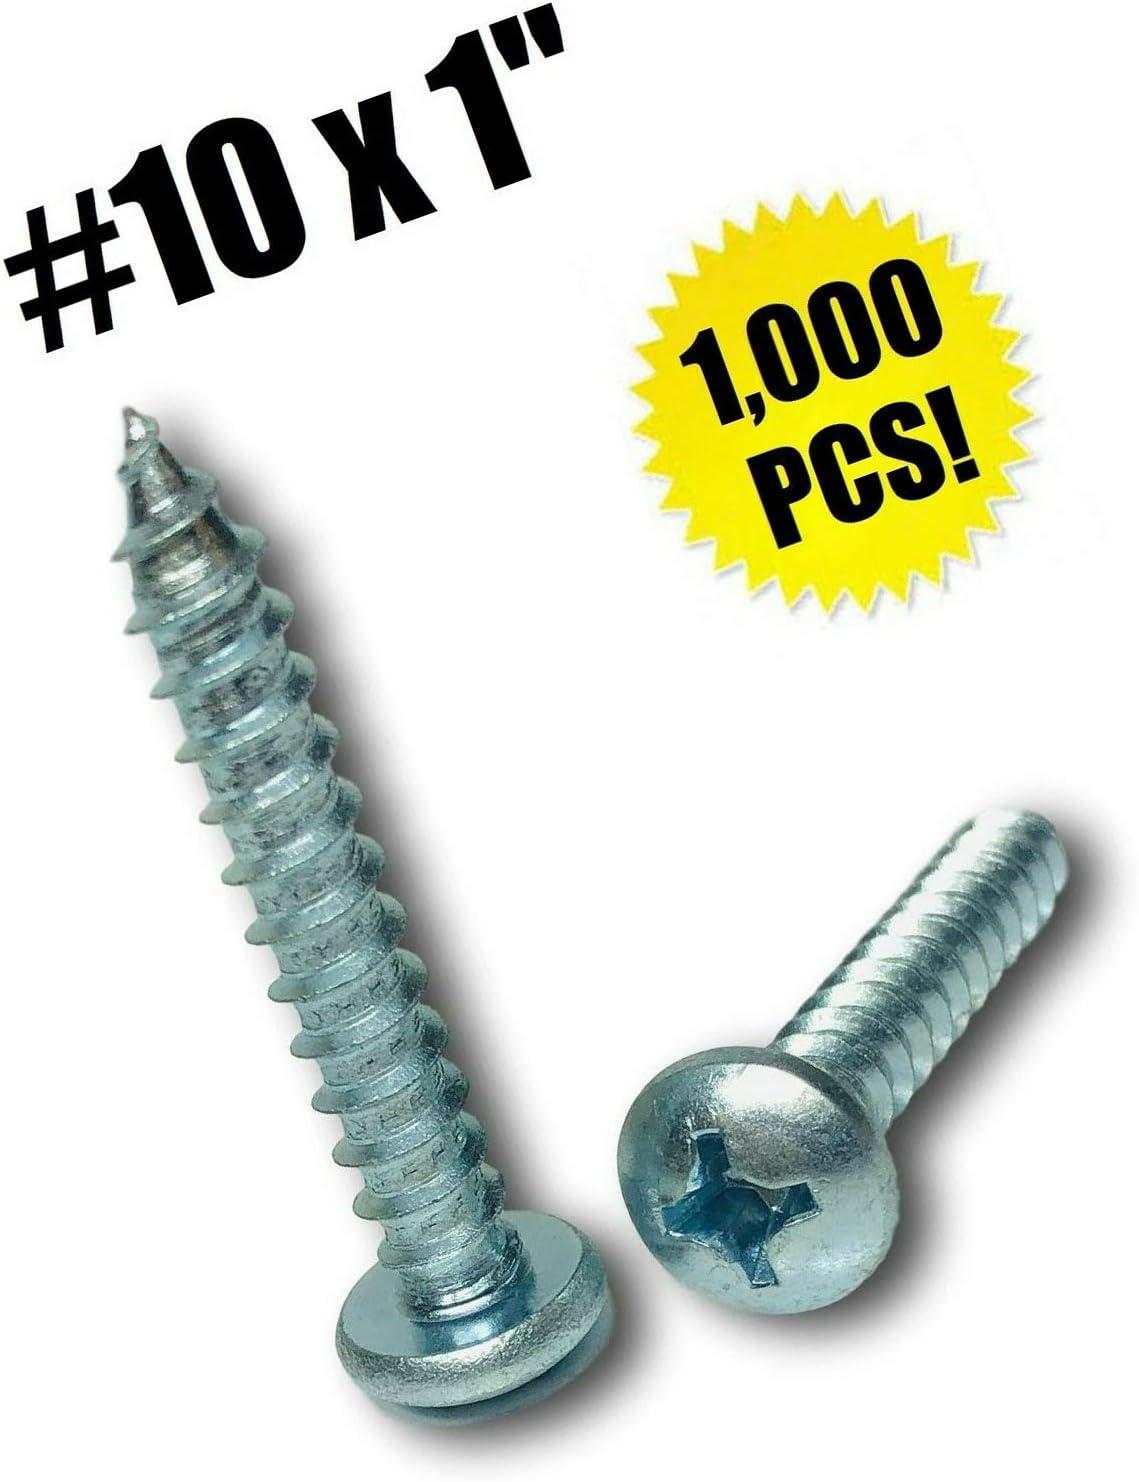 "#10 X 1"" Phillips Pan Kopf Sheet Metal Screw Zinc Plated (Qty 1000) Grade Metric Hardware Fastener Kit"